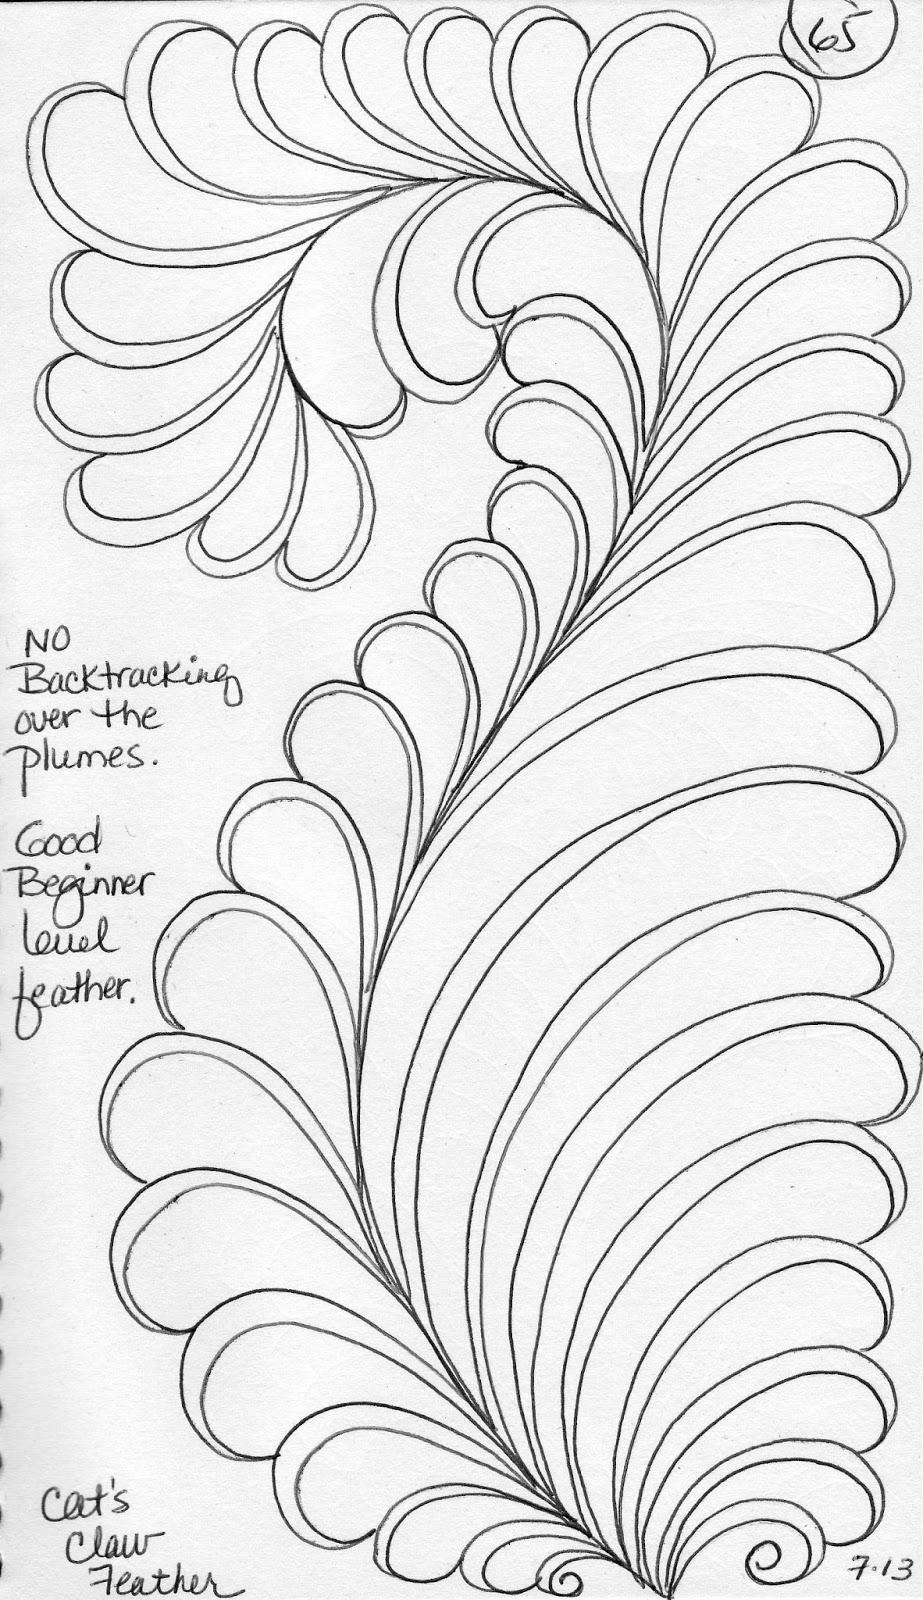 luann kessi  quilting sketch book    cat u0026 39 s claw feather tutorial